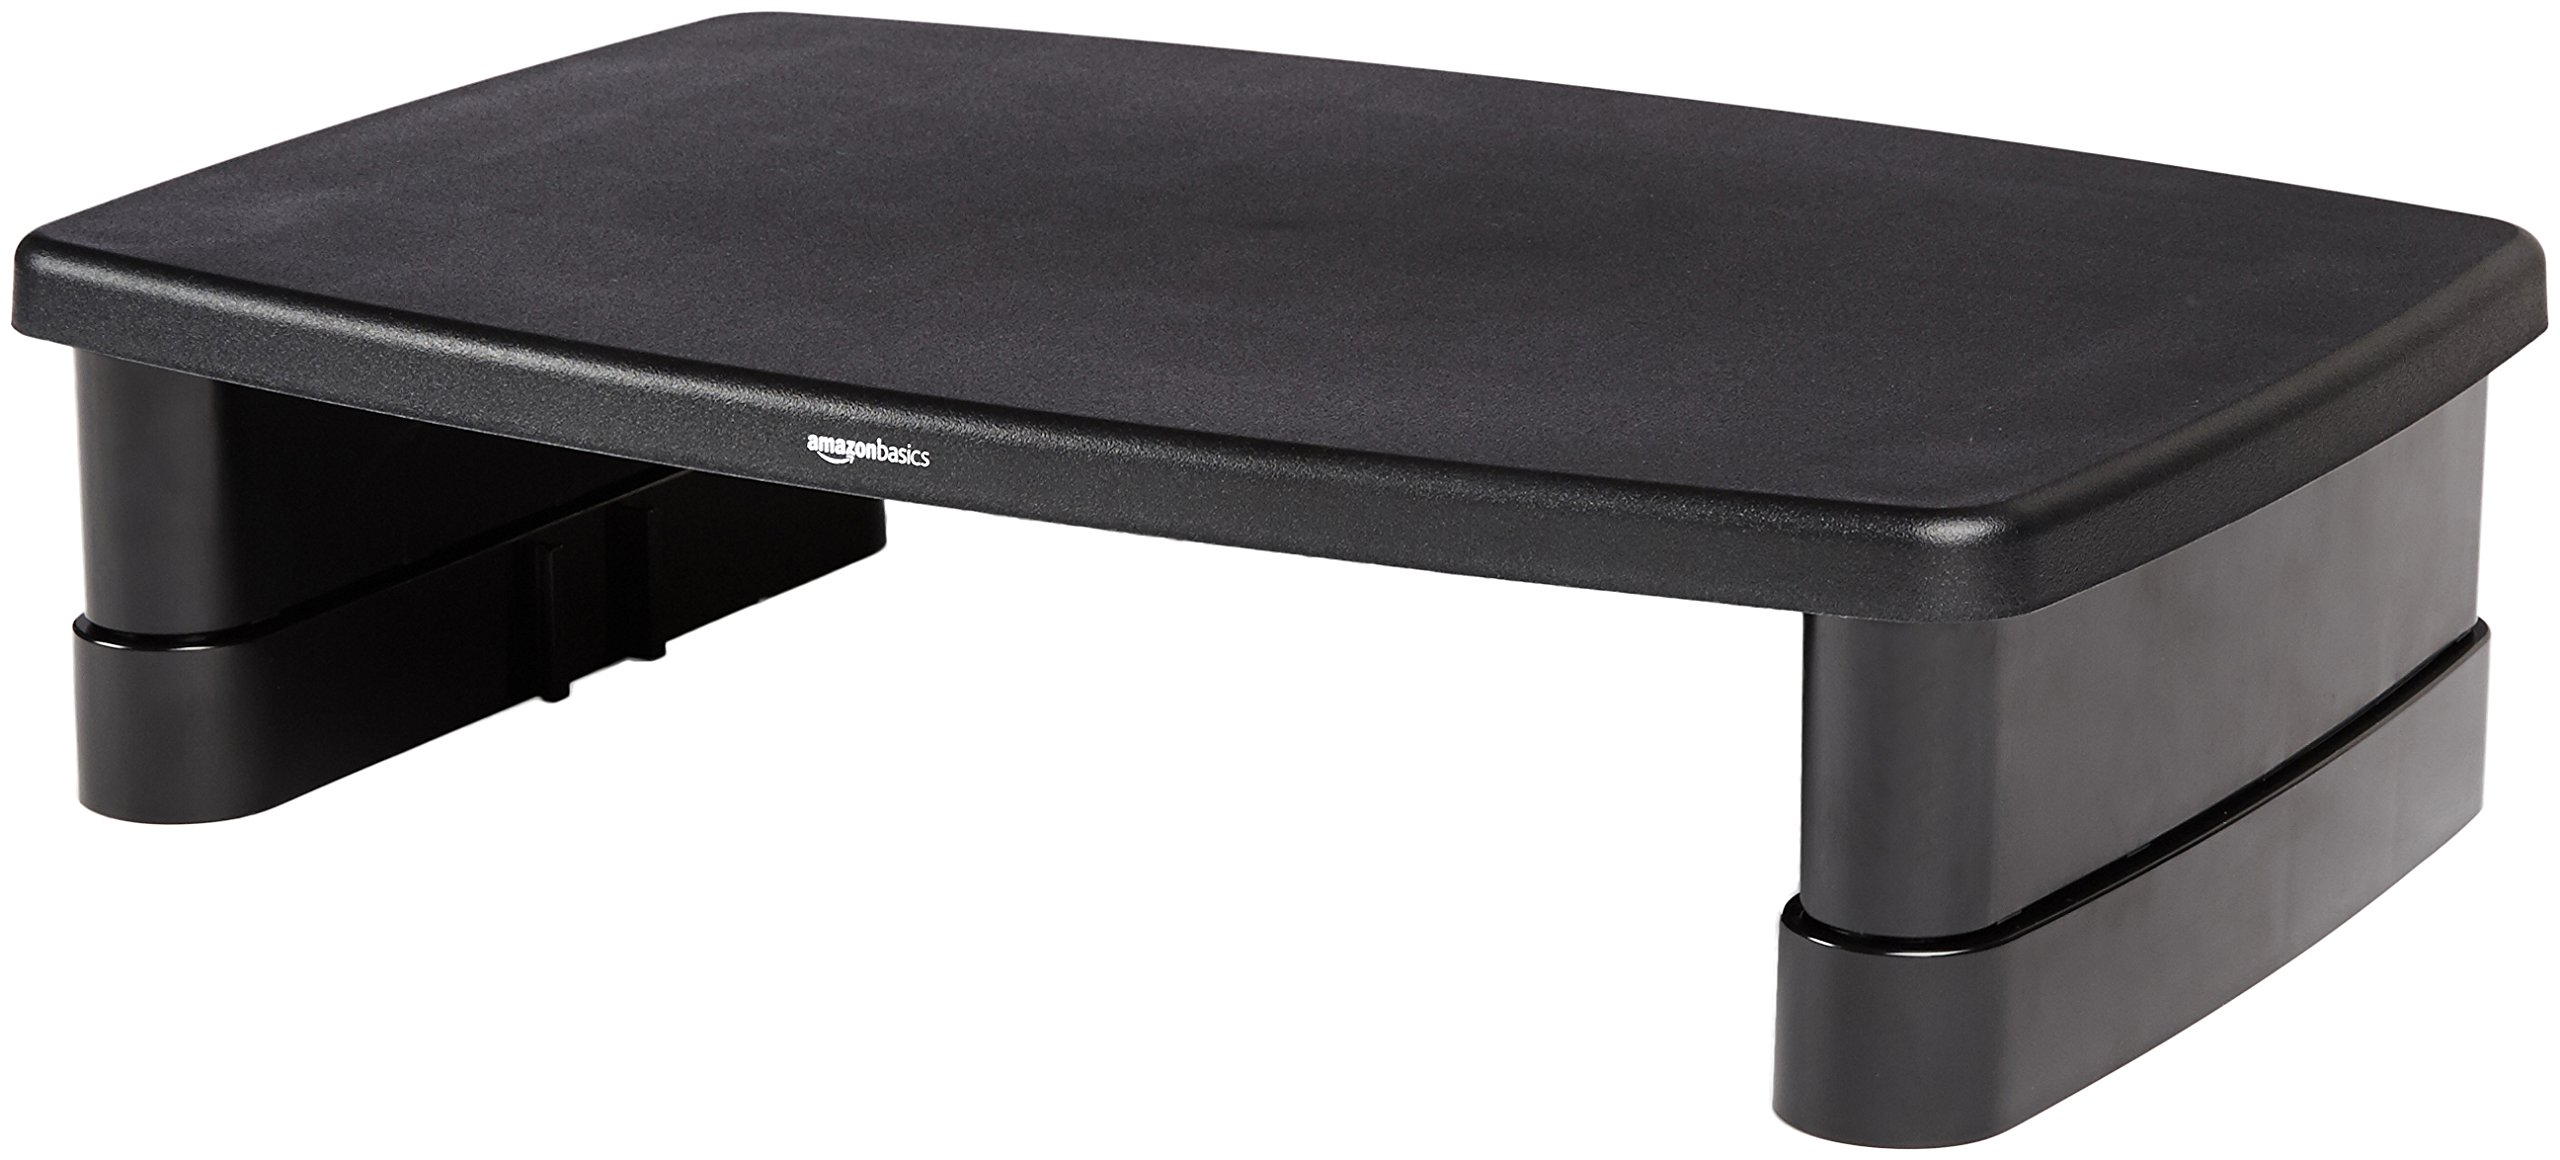 AmazonBasics Adjustable Computer Monitor Riser Desk Stand by AmazonBasics